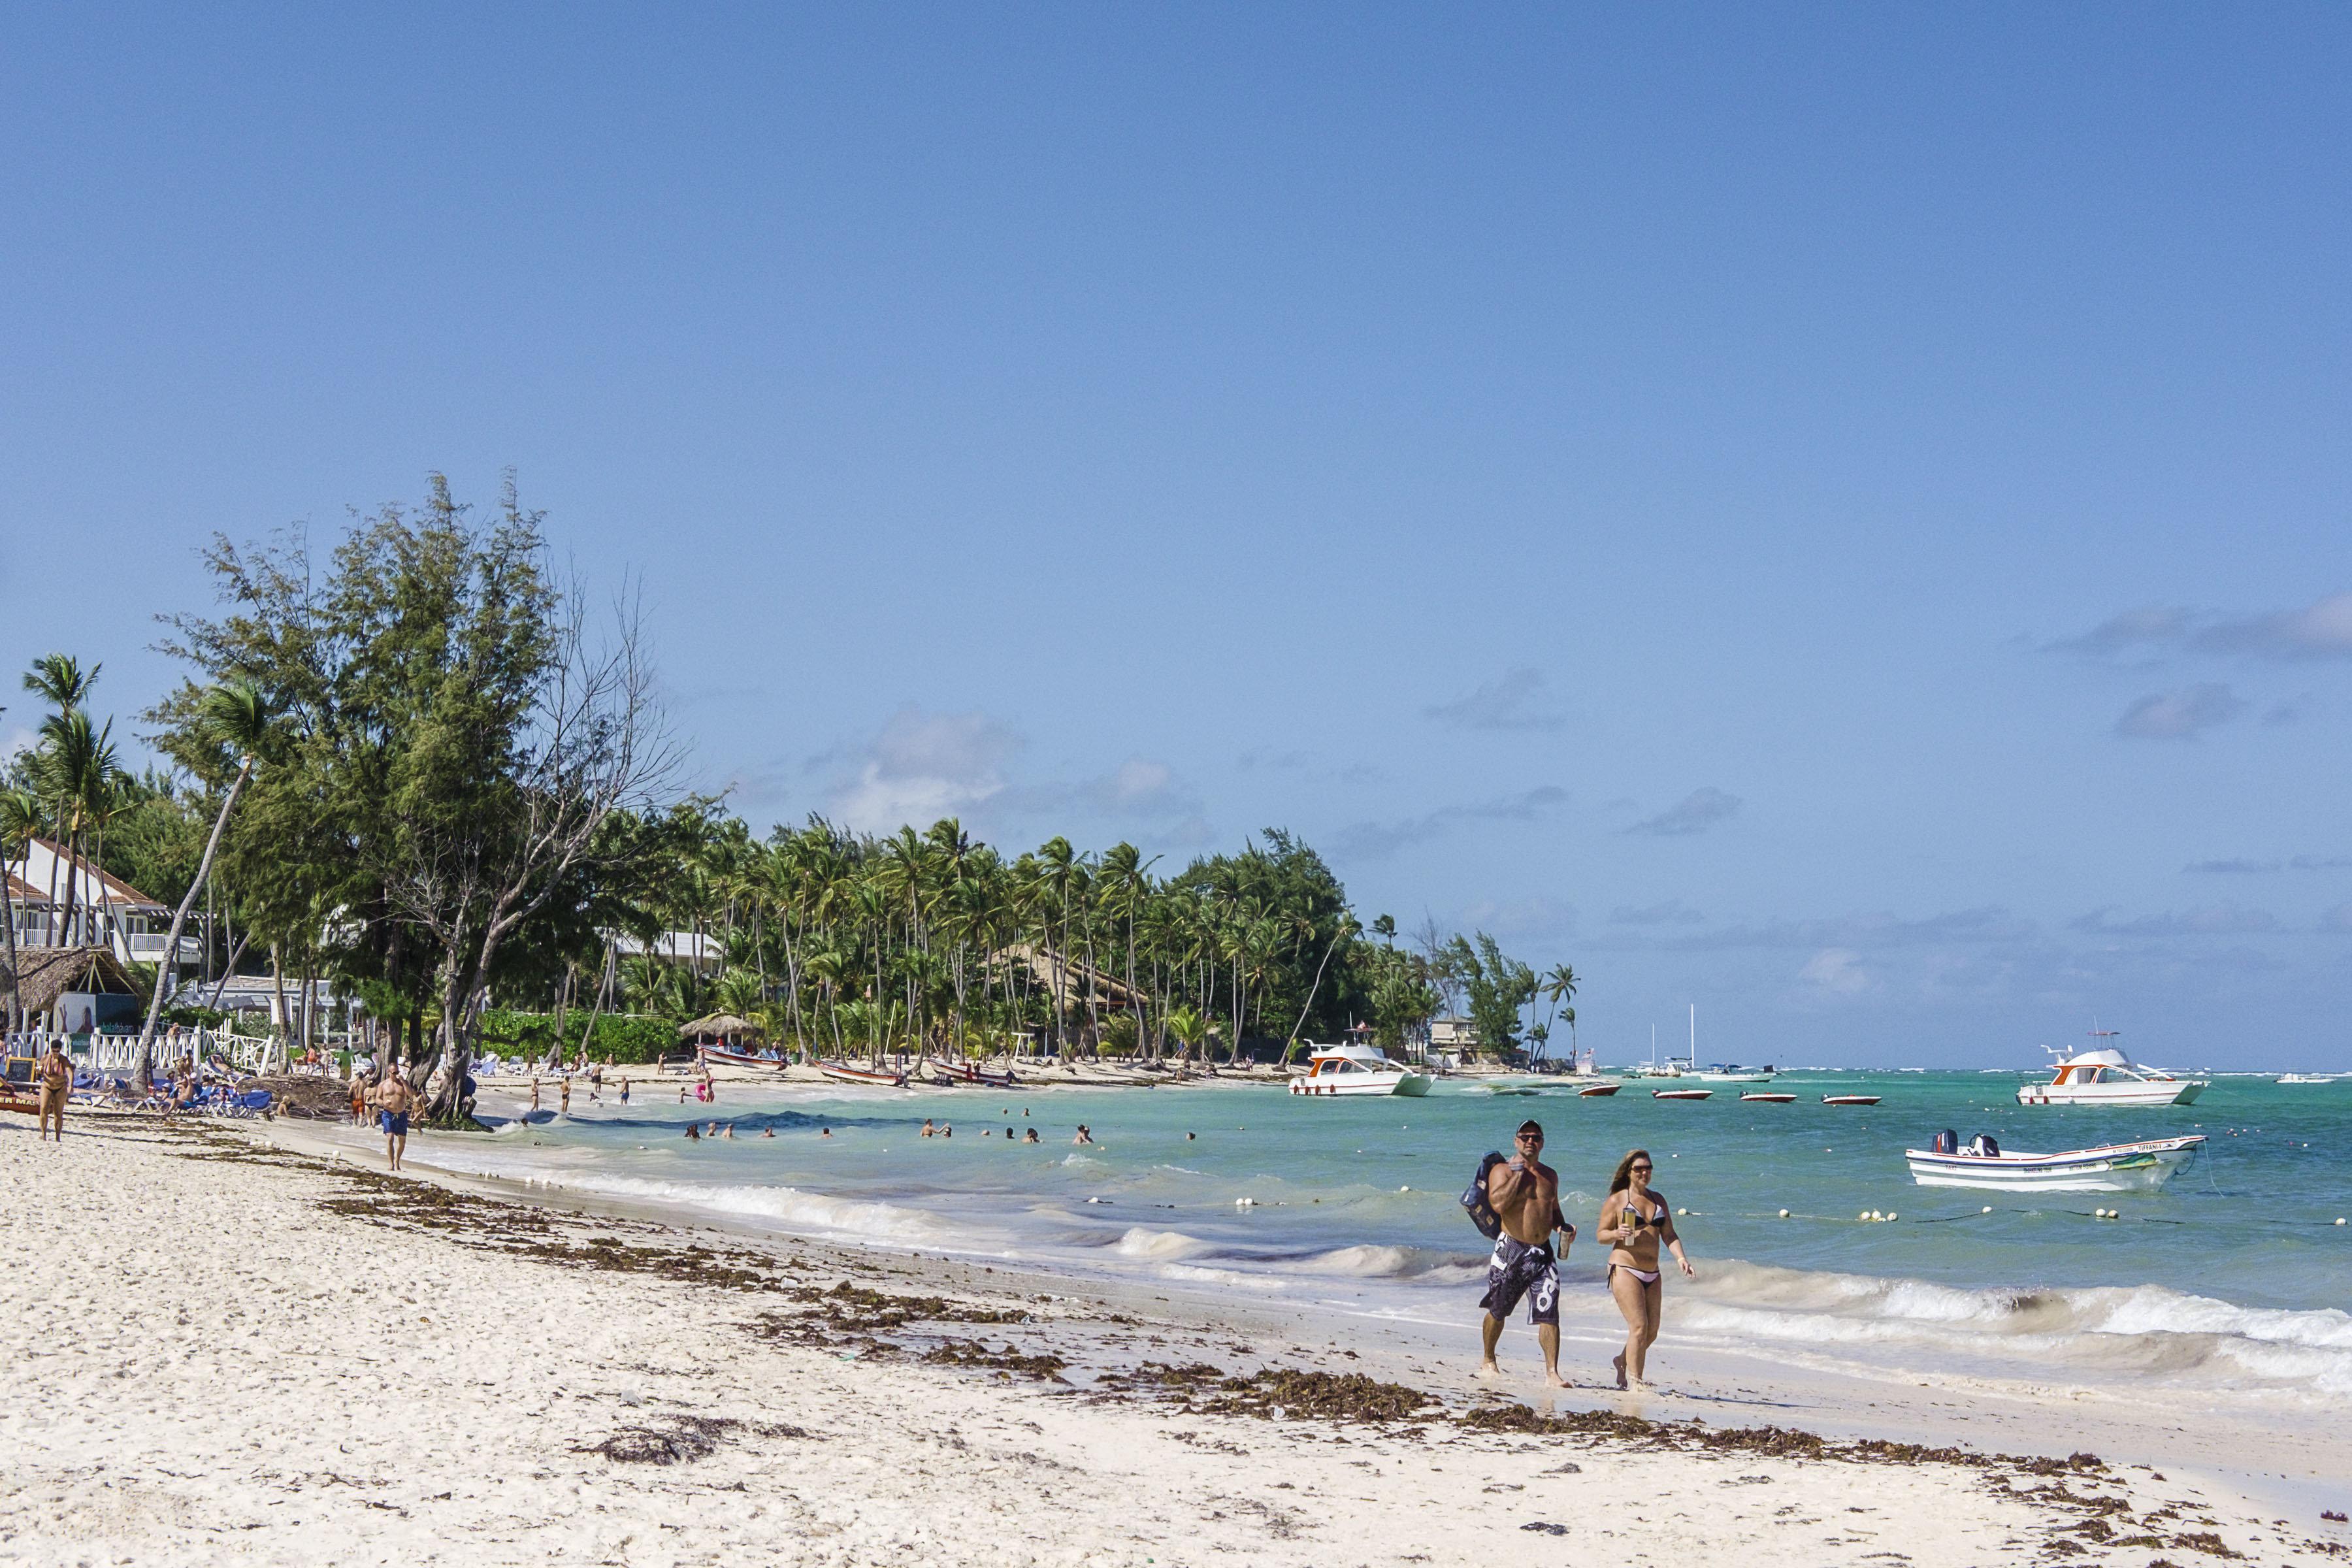 PUNTA CANA, DOMINICAN REPUBLIC - DECEMBER 30:  General view of Bavaro Beach, El Cortecito on December 30, 2016 in Punta Cana Dominican Republic. (Photo by Santiago Vidal/LatinContent/Getty Images)